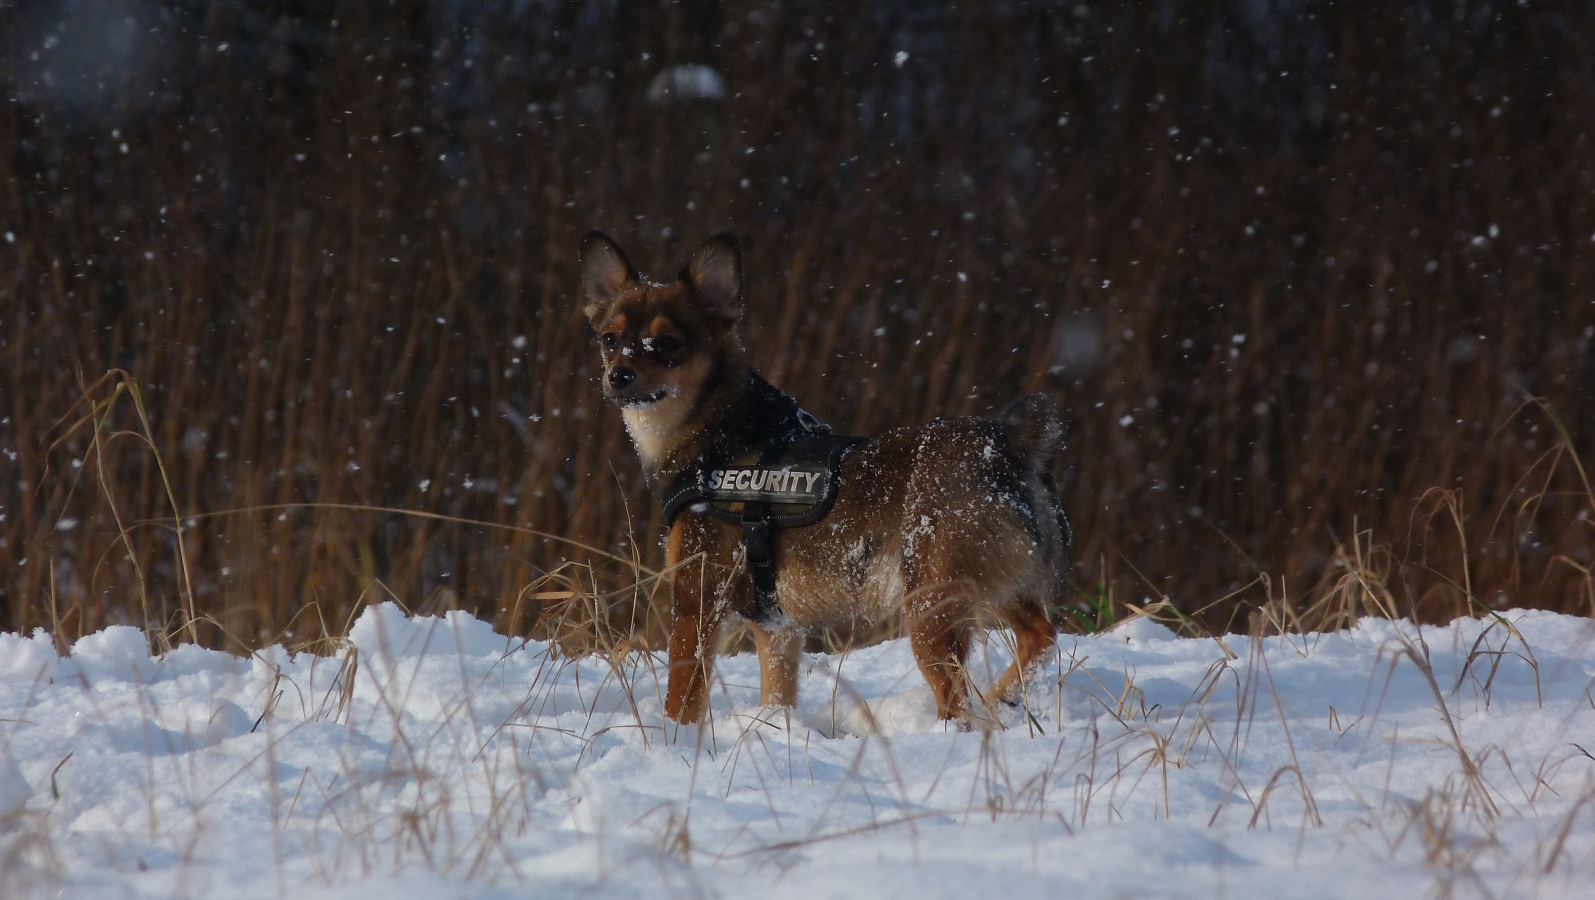 Snowfall by oOBrushstrokeOo